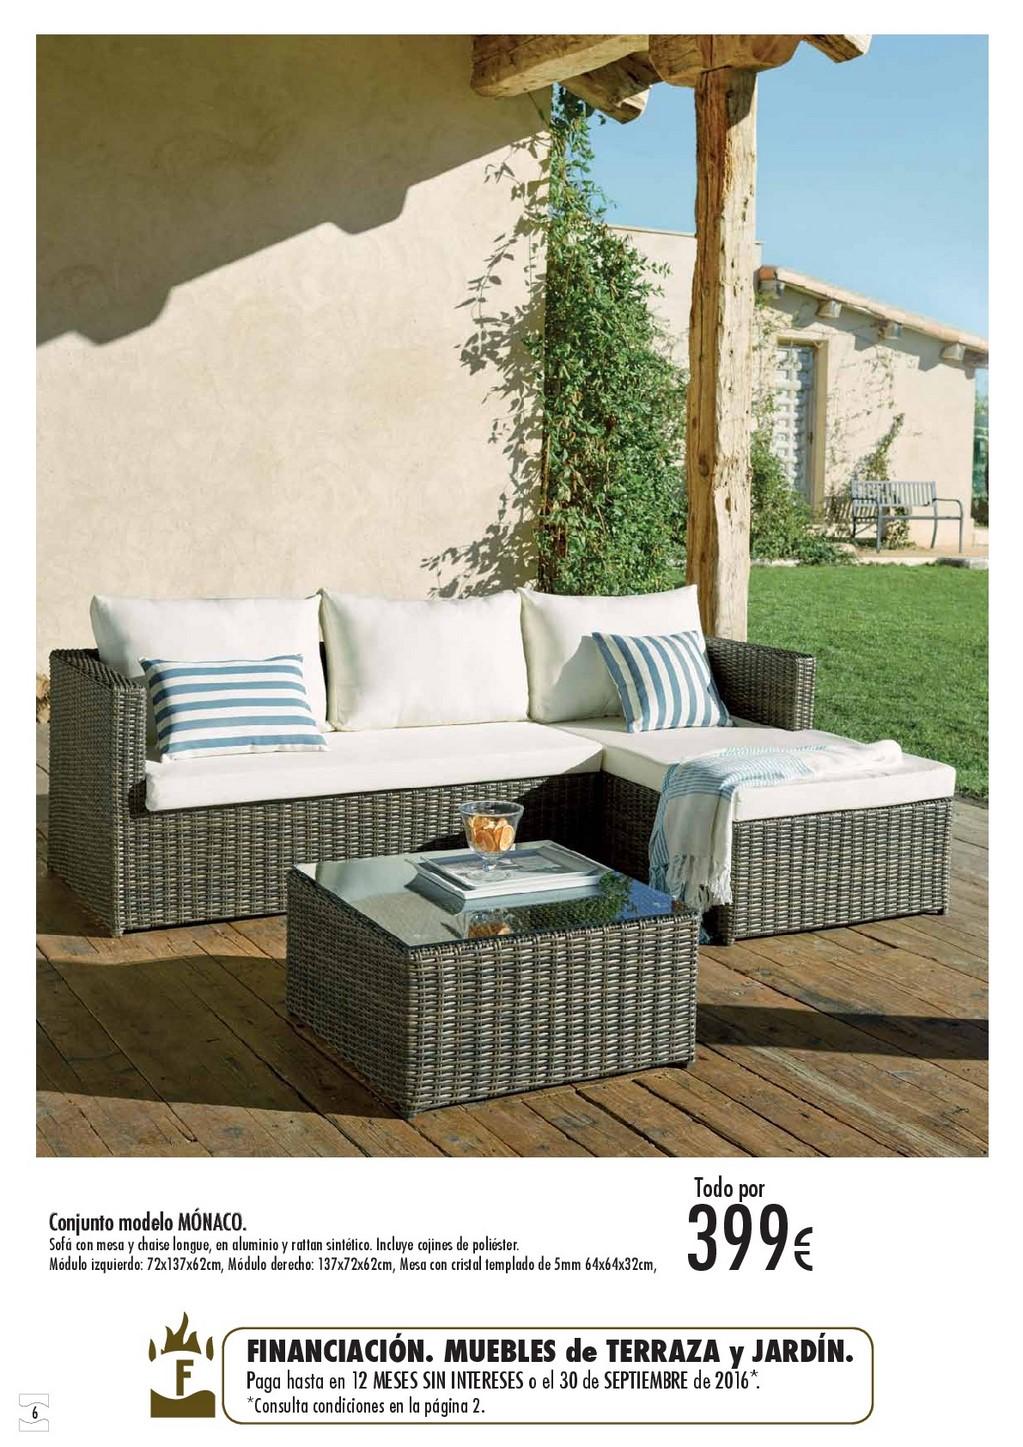 Terraza y jardin hipercor 20166 - Carrefour terraza y jardin ...